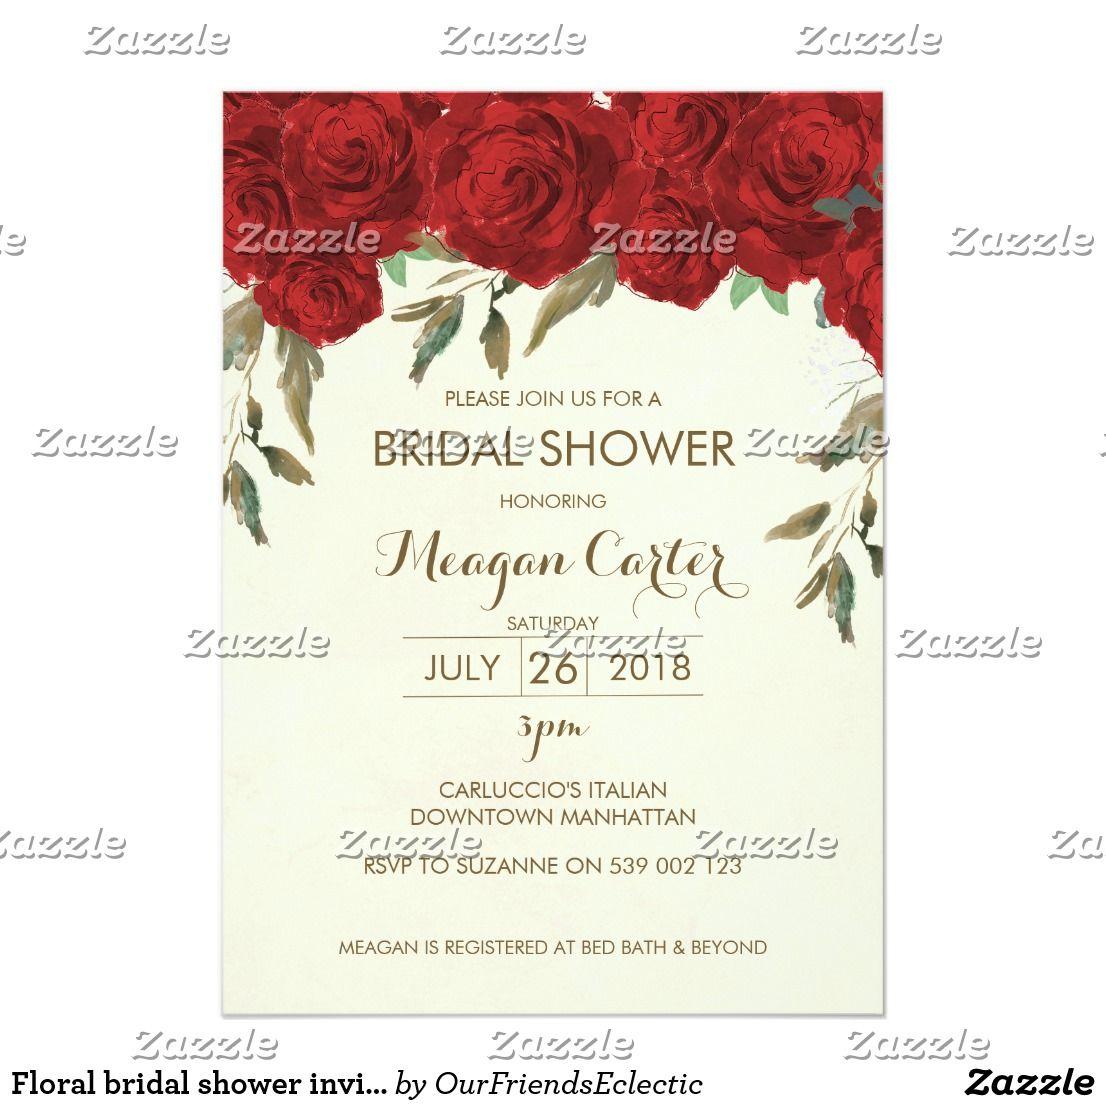 Floral bridal shower invitation ivory red roses | Pinterest | Red ...